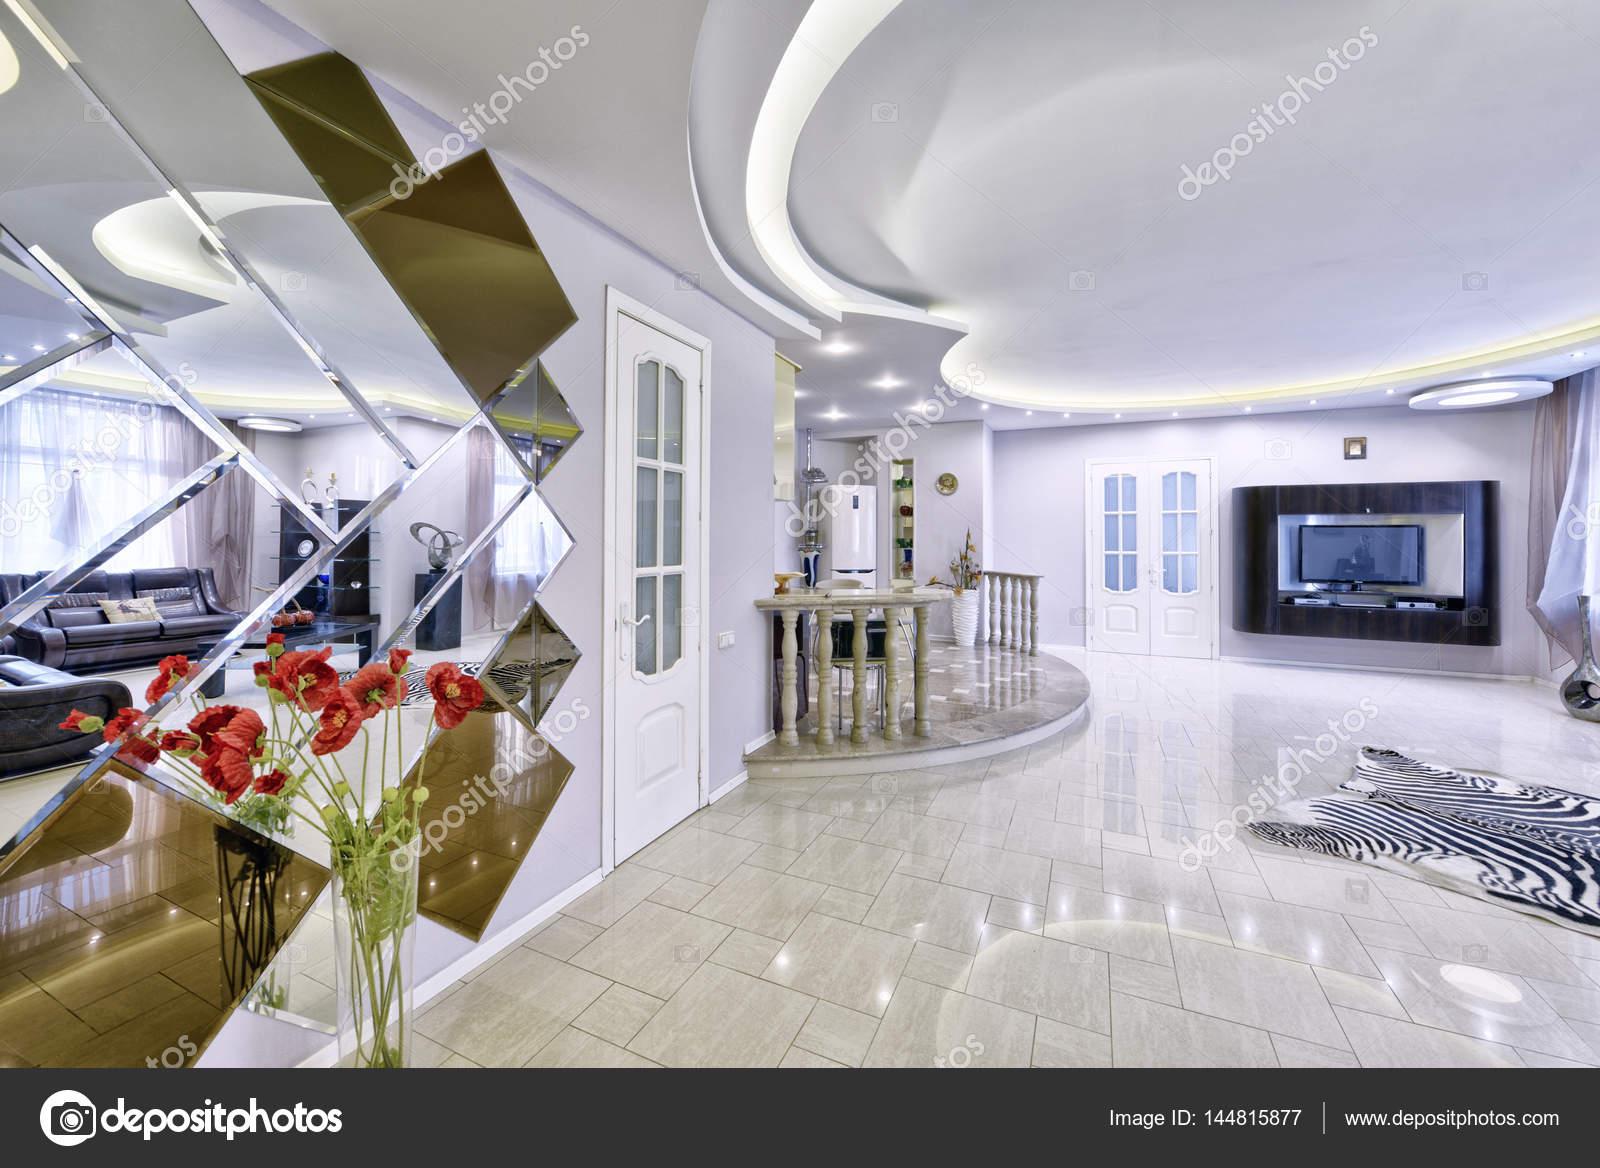 Modern Interieur Woonkamer : Modern interieur woonkamer stedelijk vastgoed u2014 stockfoto